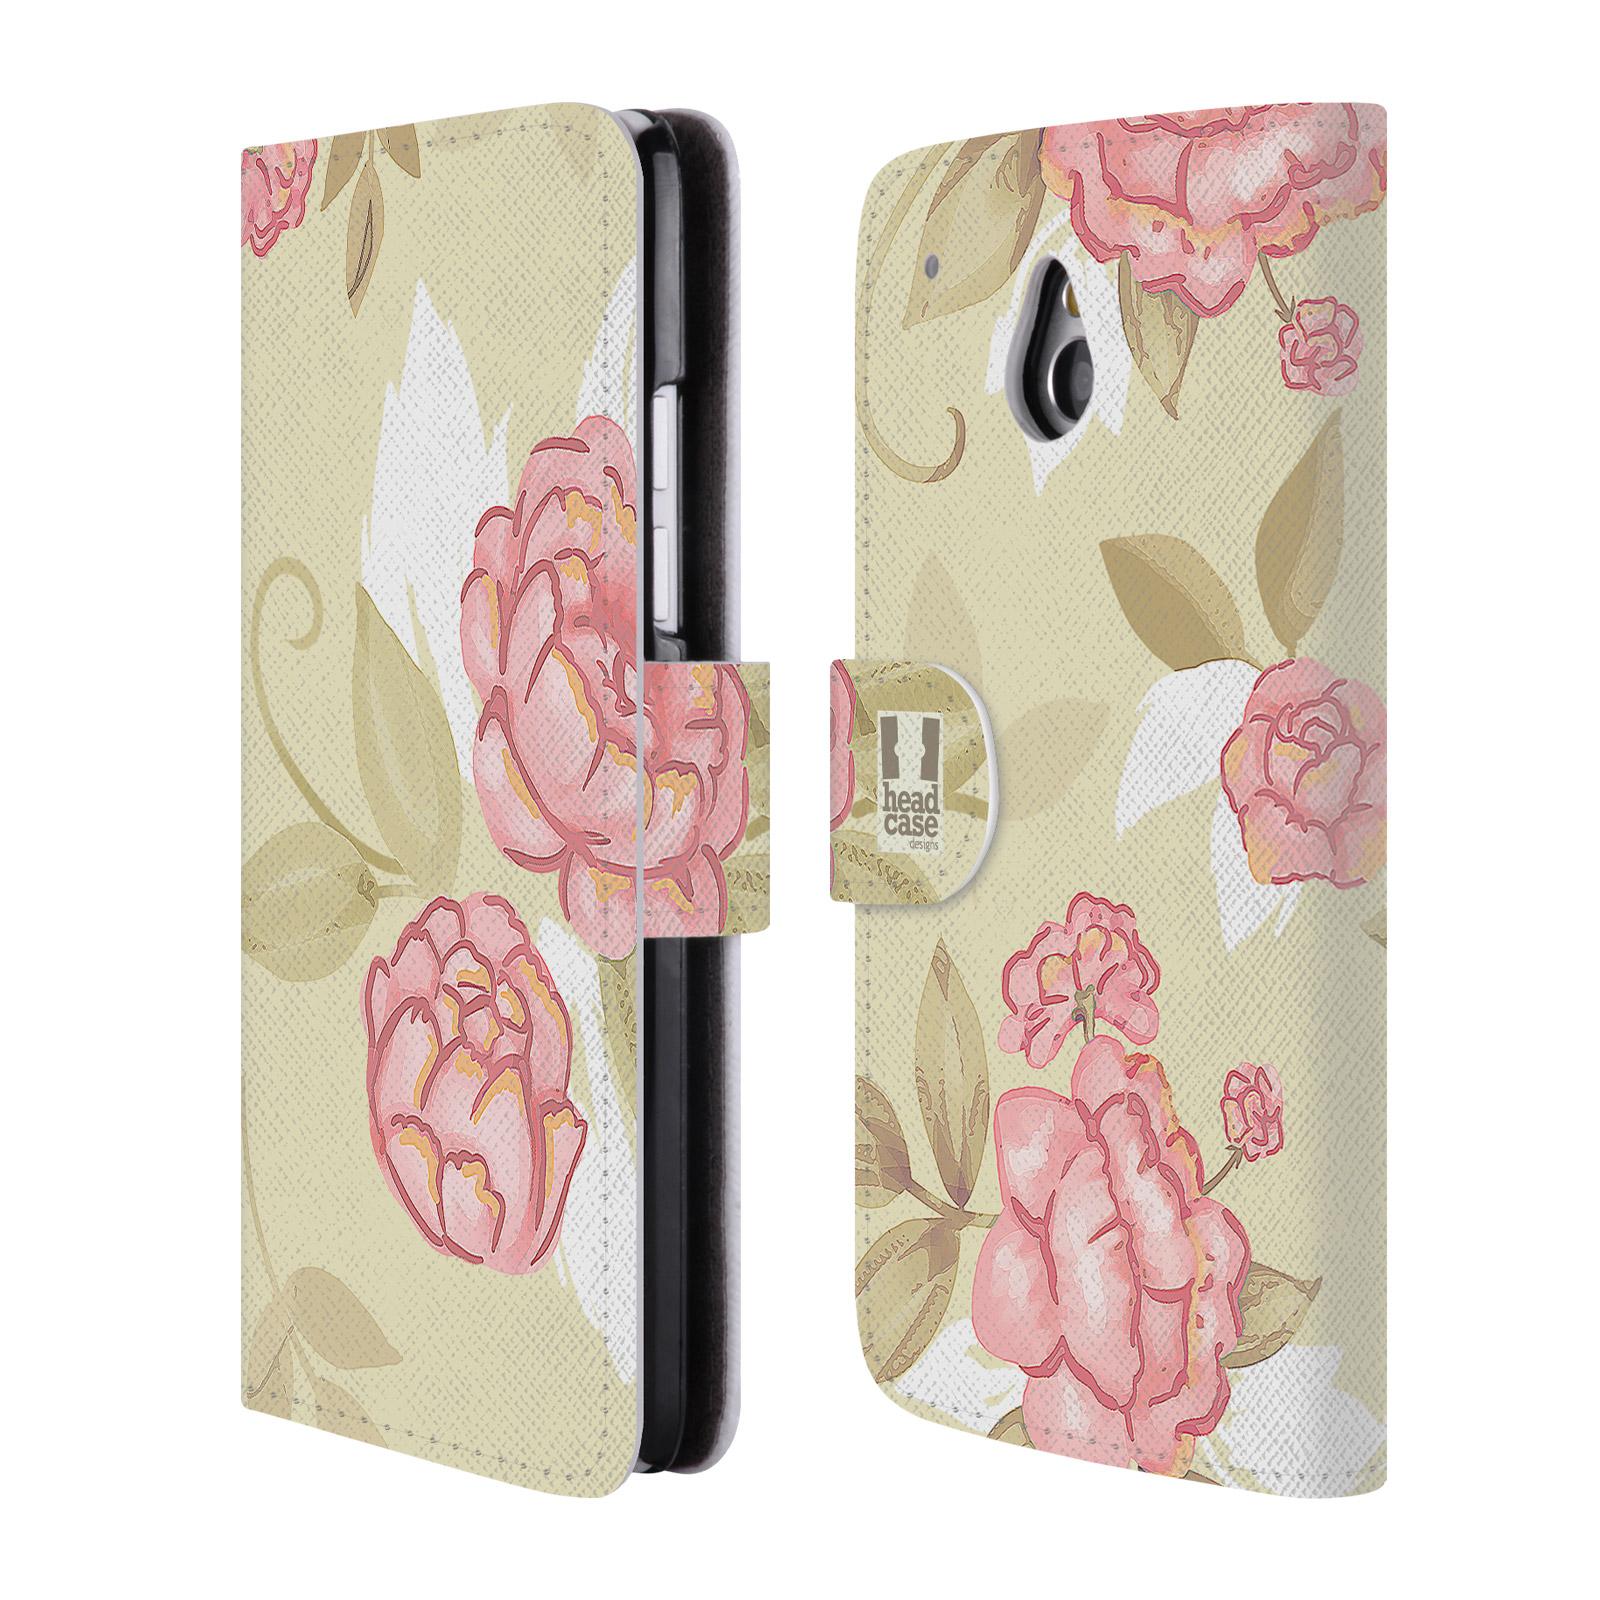 HEAD CASE Flipové pouzdro pro mobil HTC ONE MINI (M4) Francouzský venkov růže VINTAGE